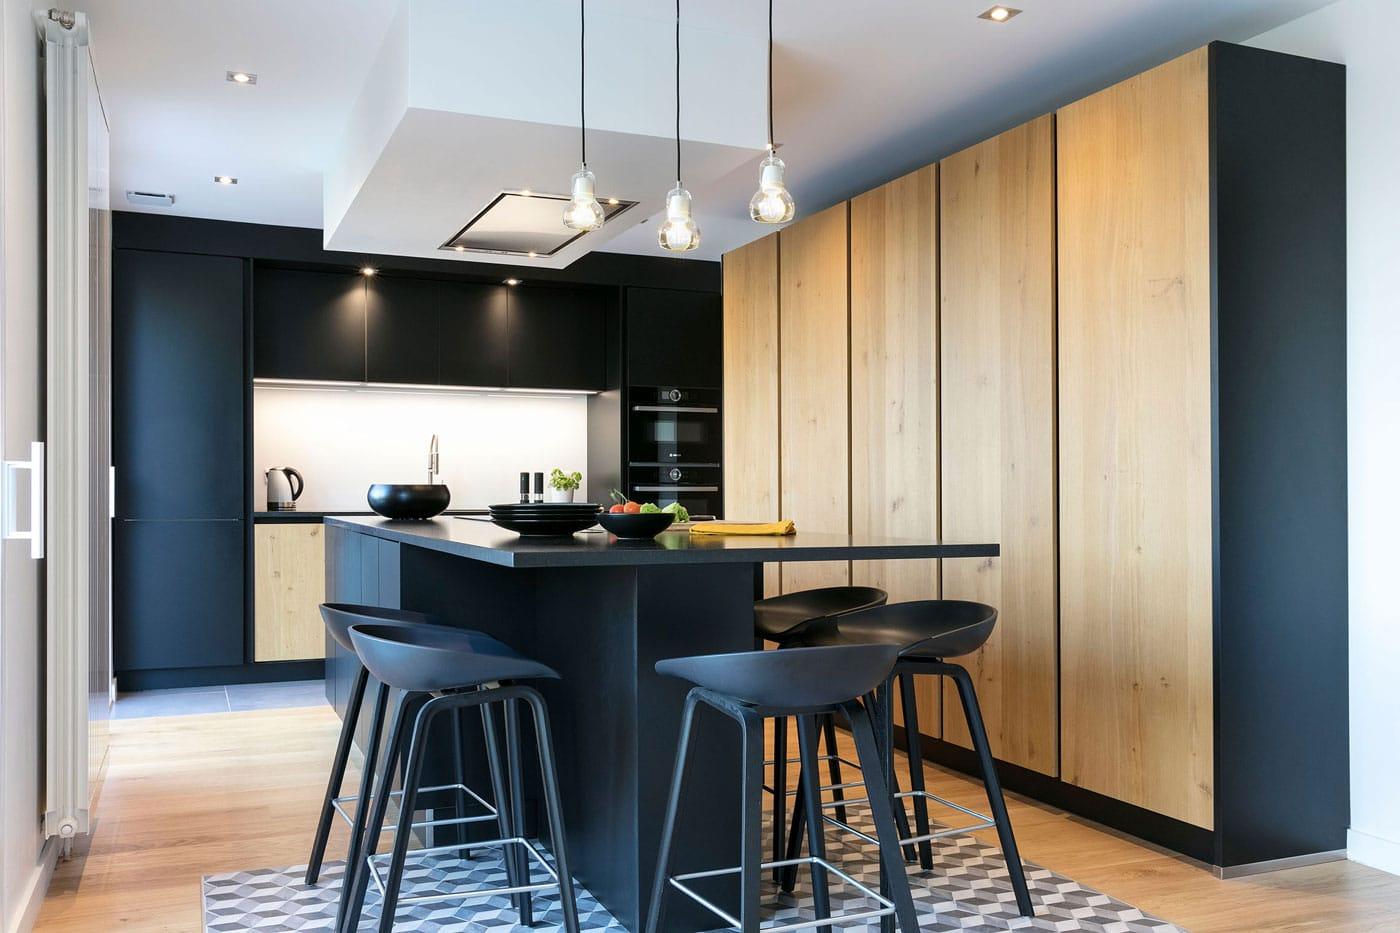 Maison design graphique - Yvelines